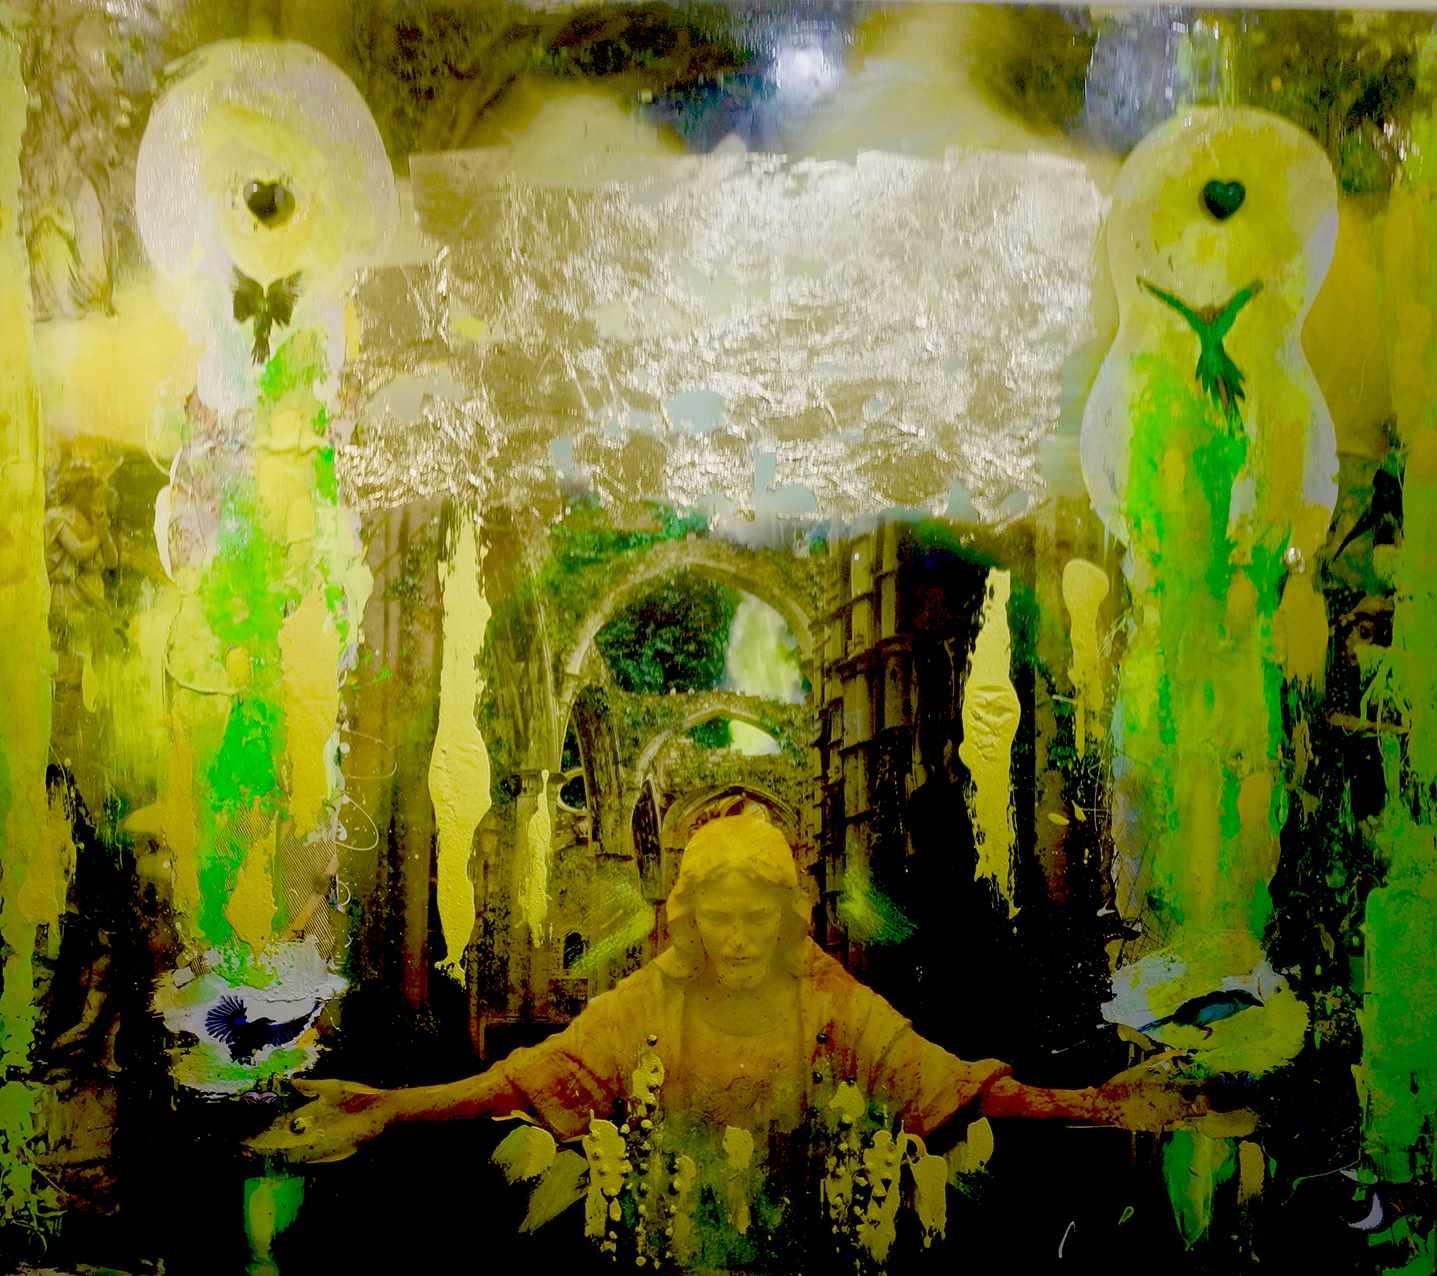 bresil rio chayan khoi peintre artiste iranien